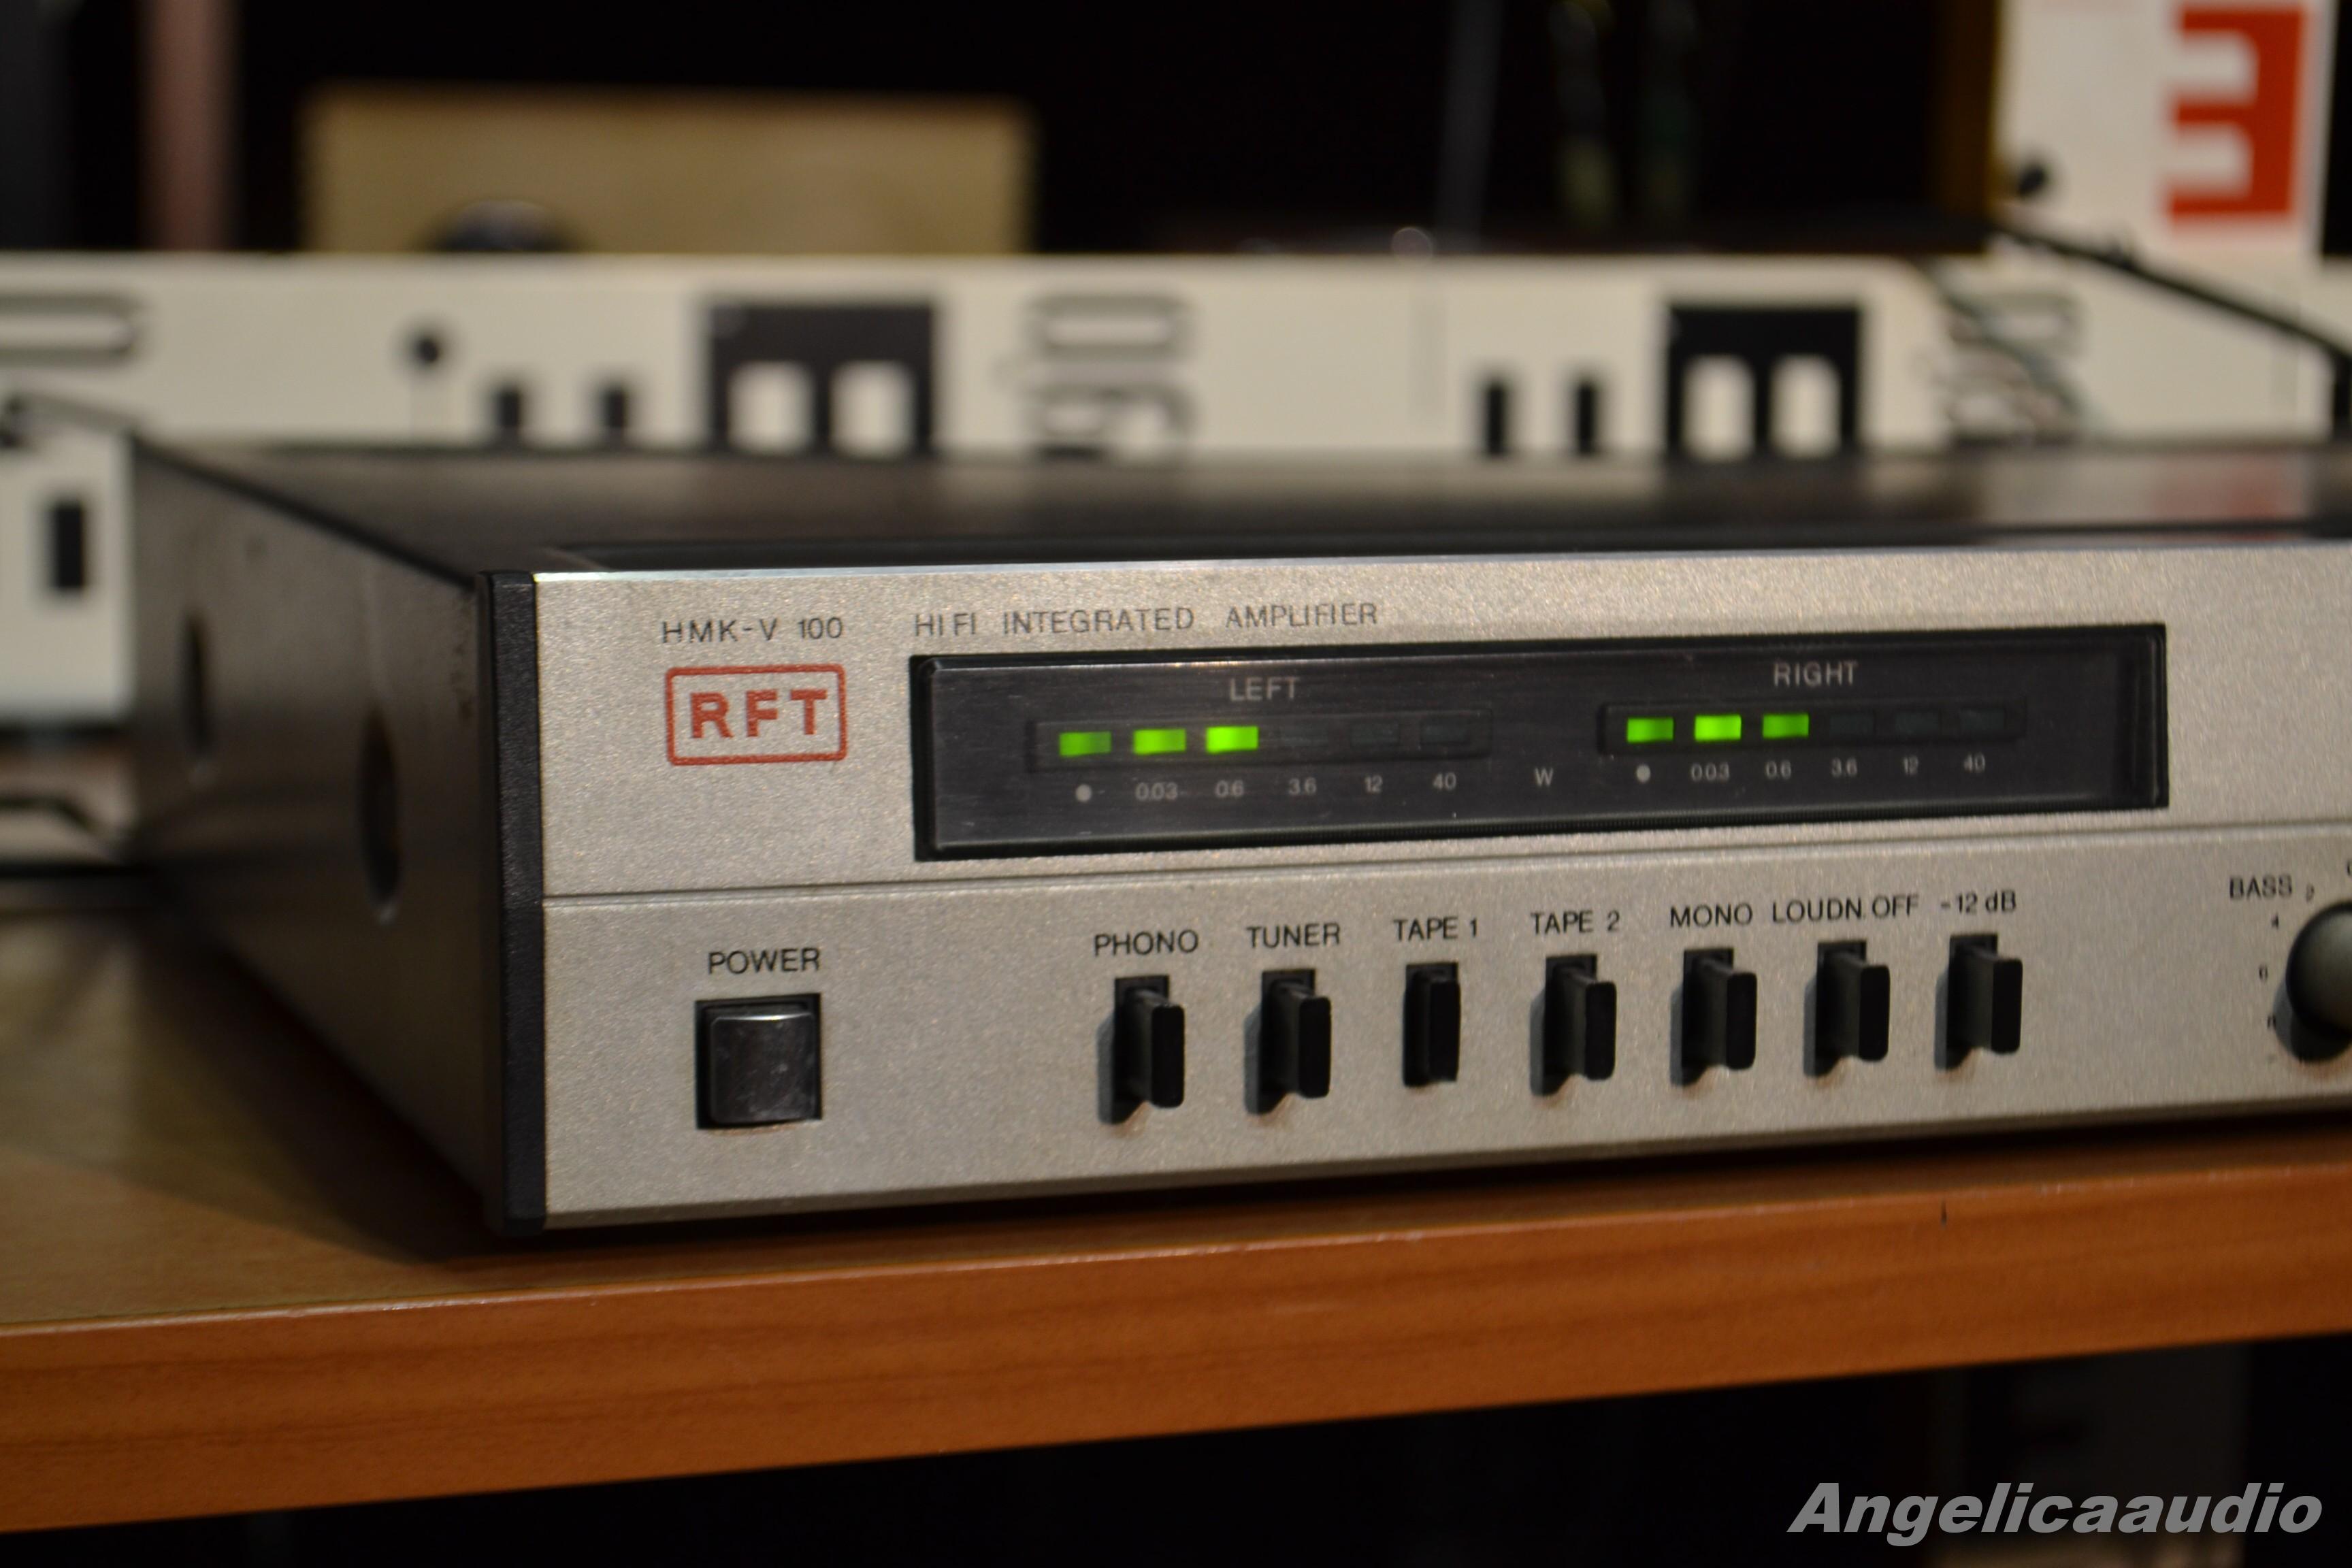 Rft Hmk V 100 Stereo Amplifier No 2850 Angelicaaudio 1990